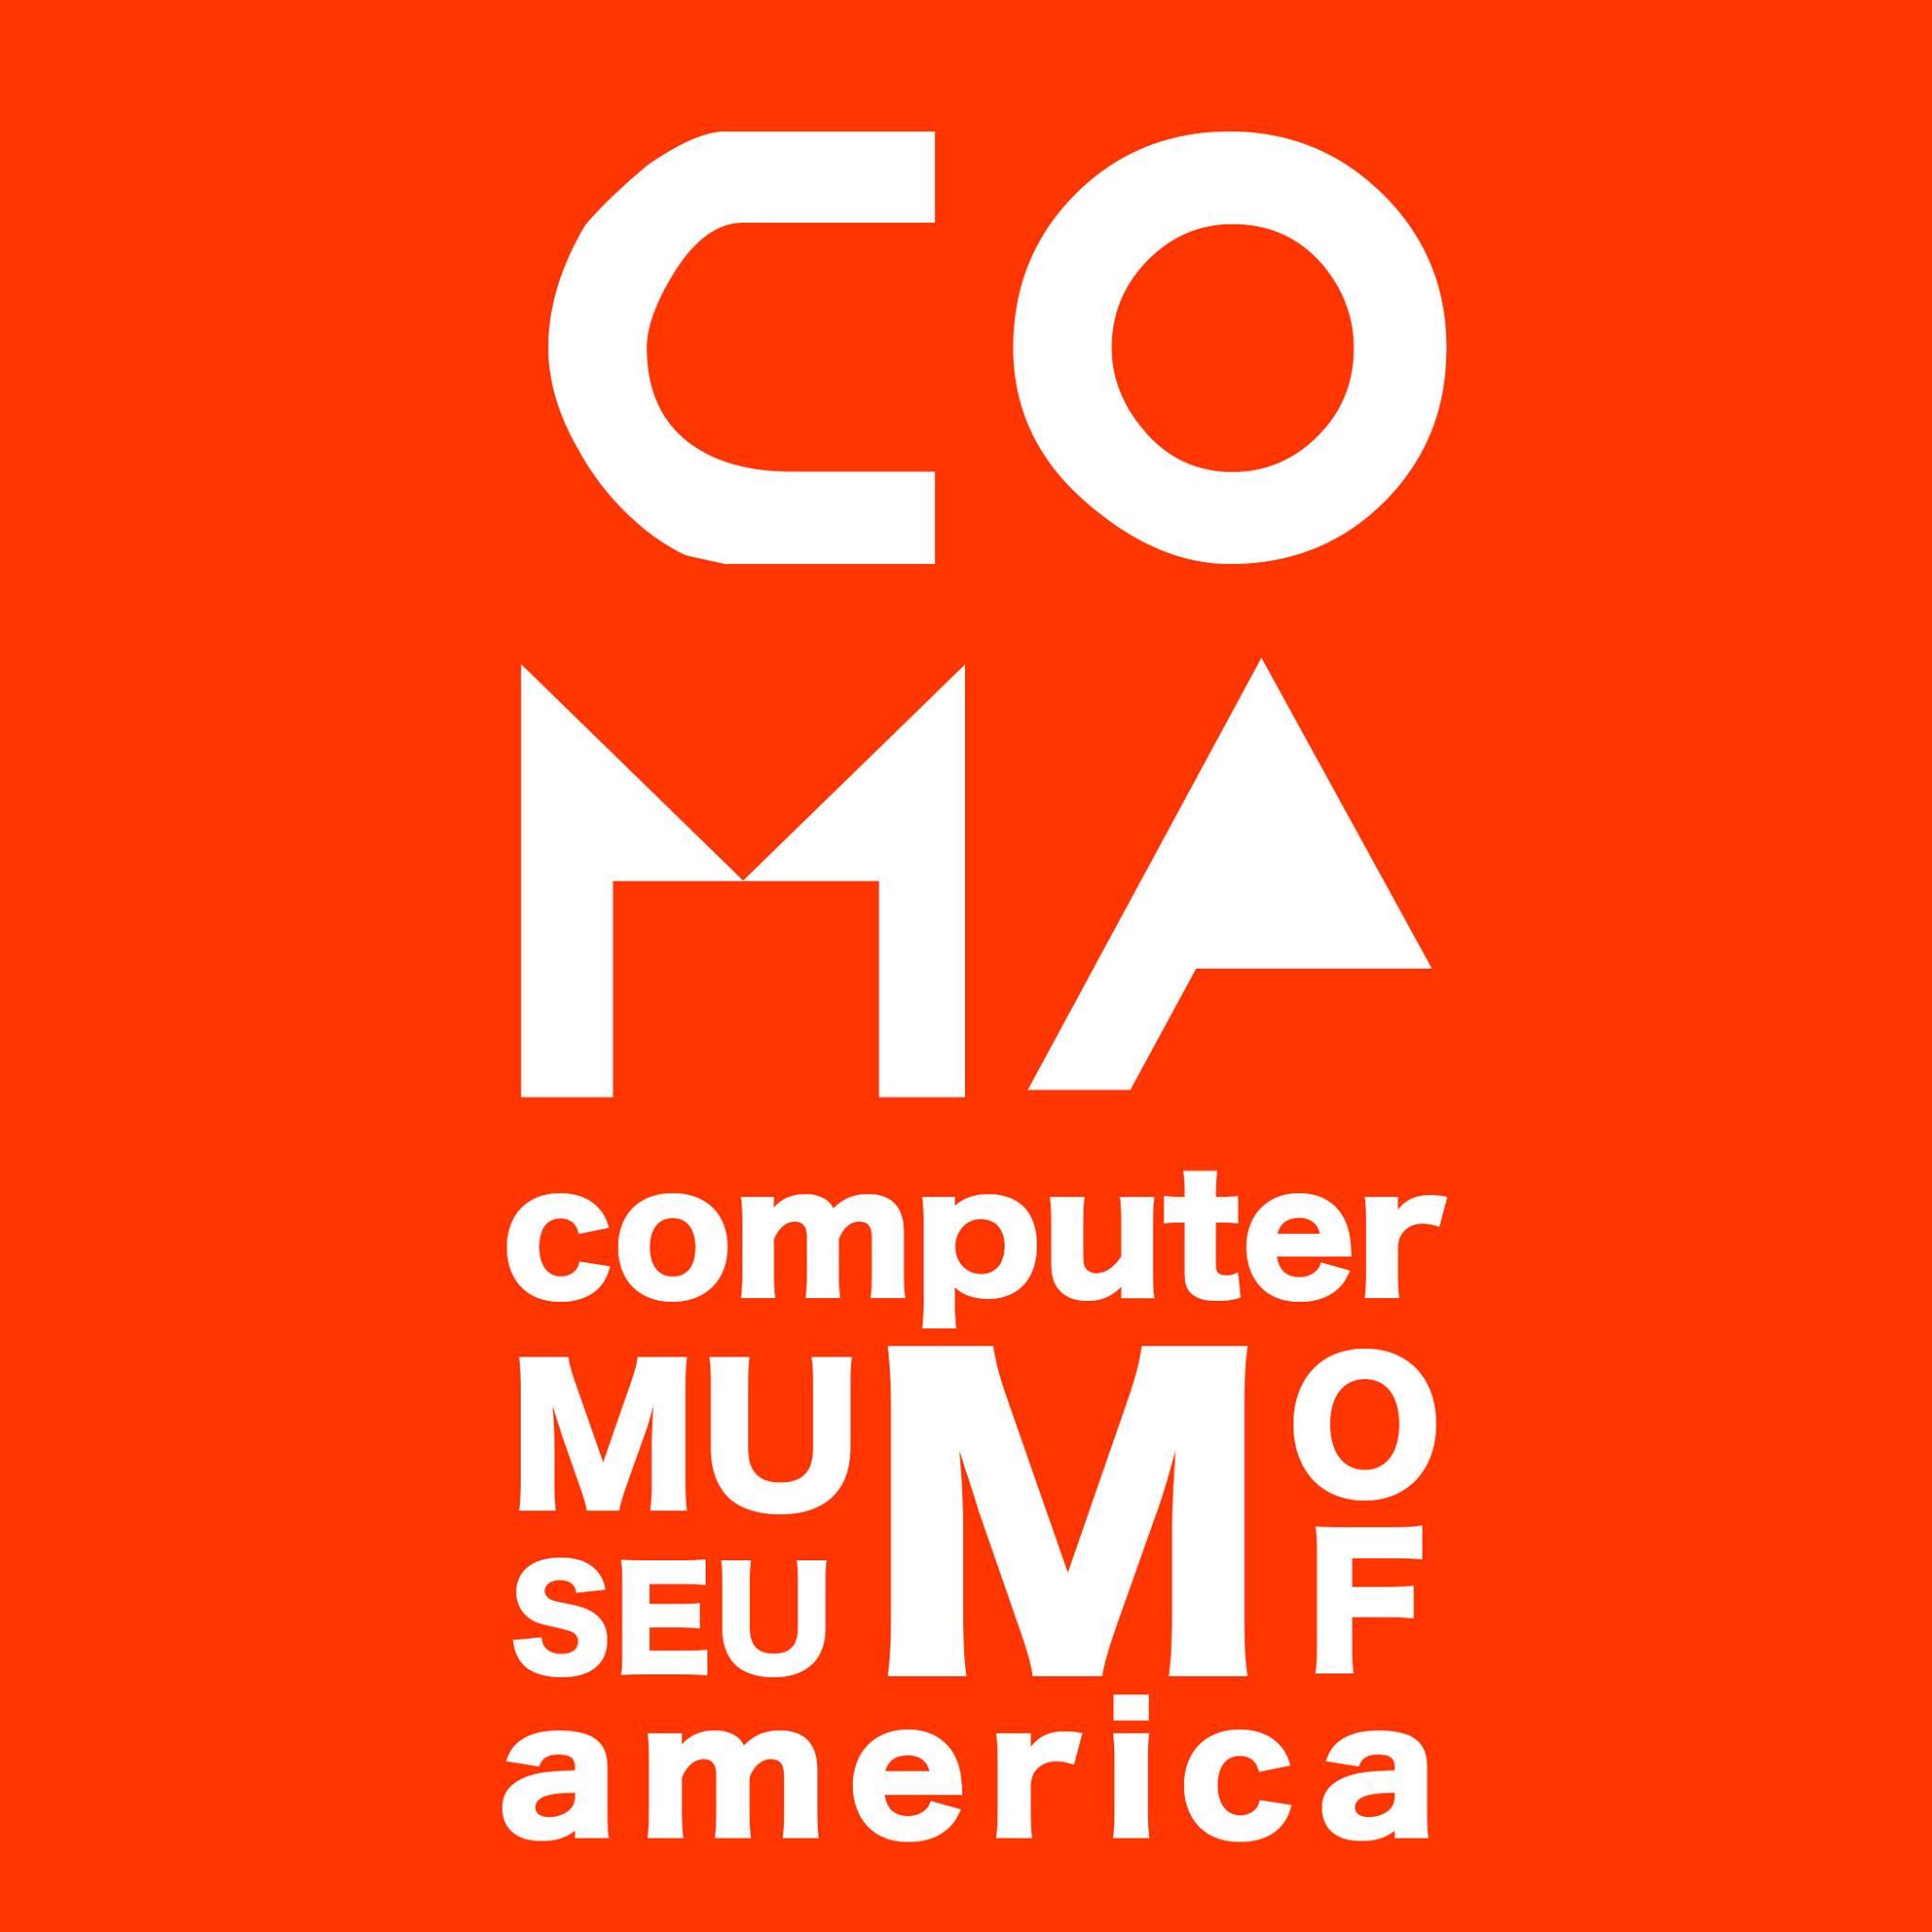 Computer Museum of America logo